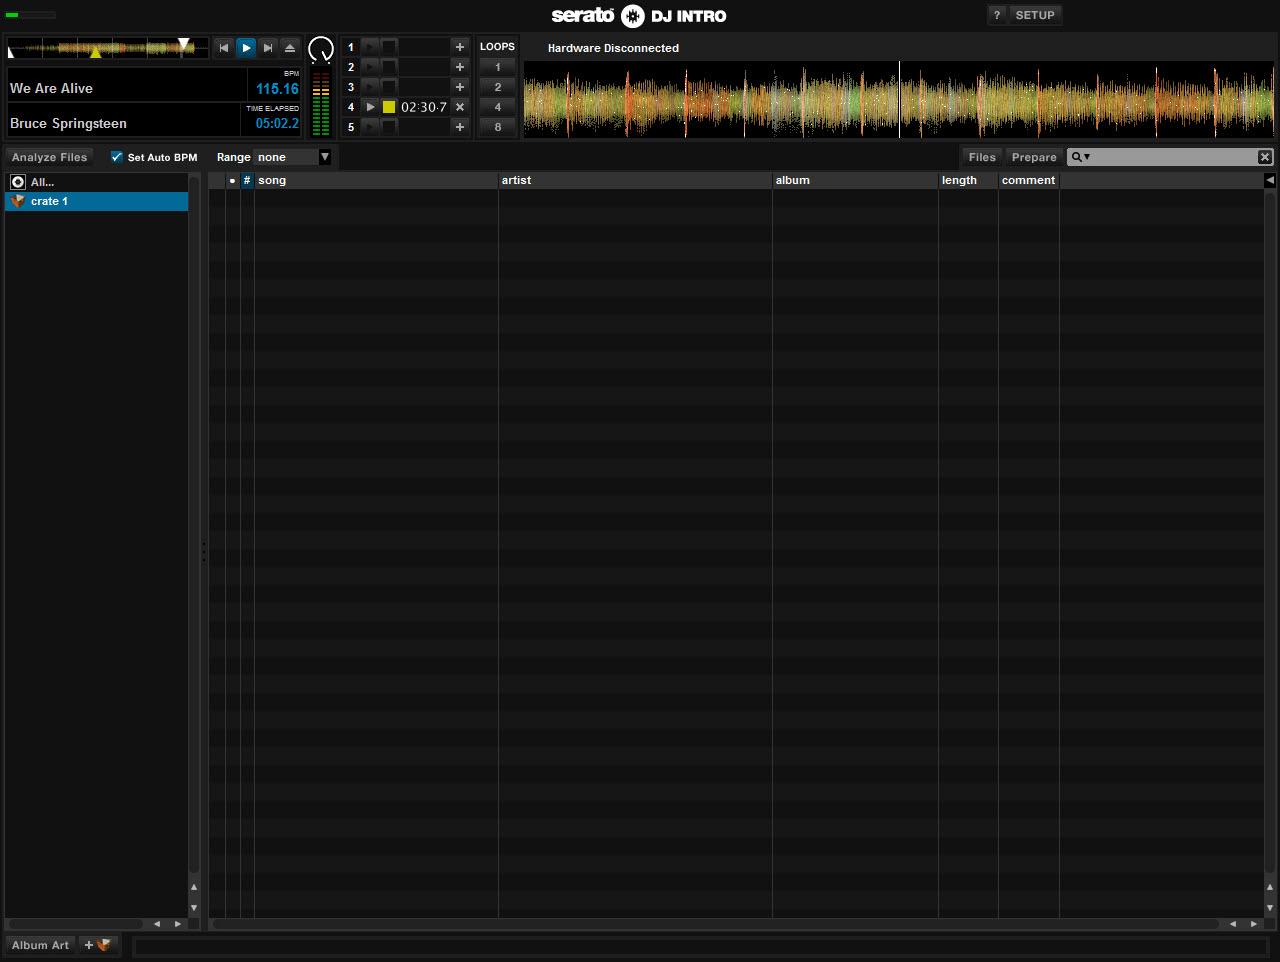 Serato DJ Intro